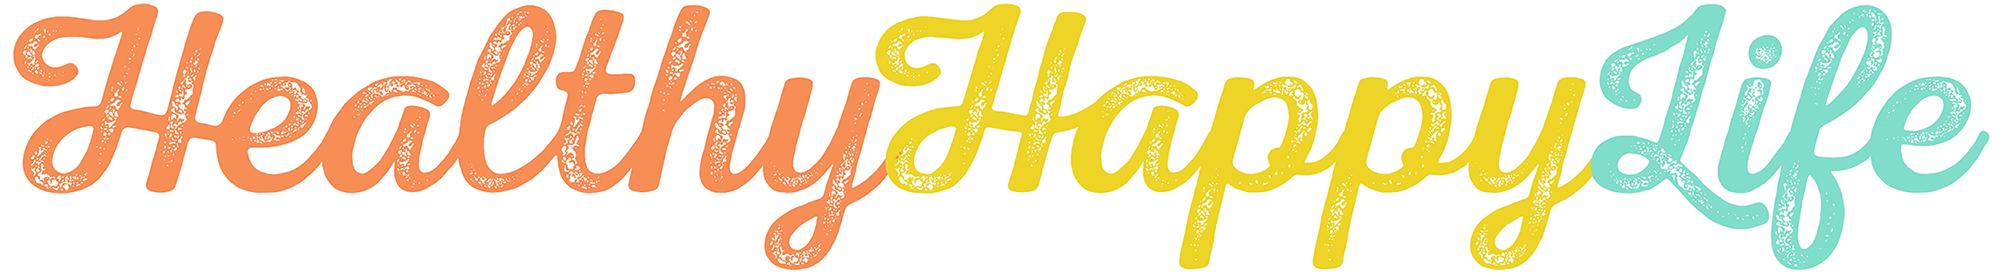 HealthyHappyLife.com logo